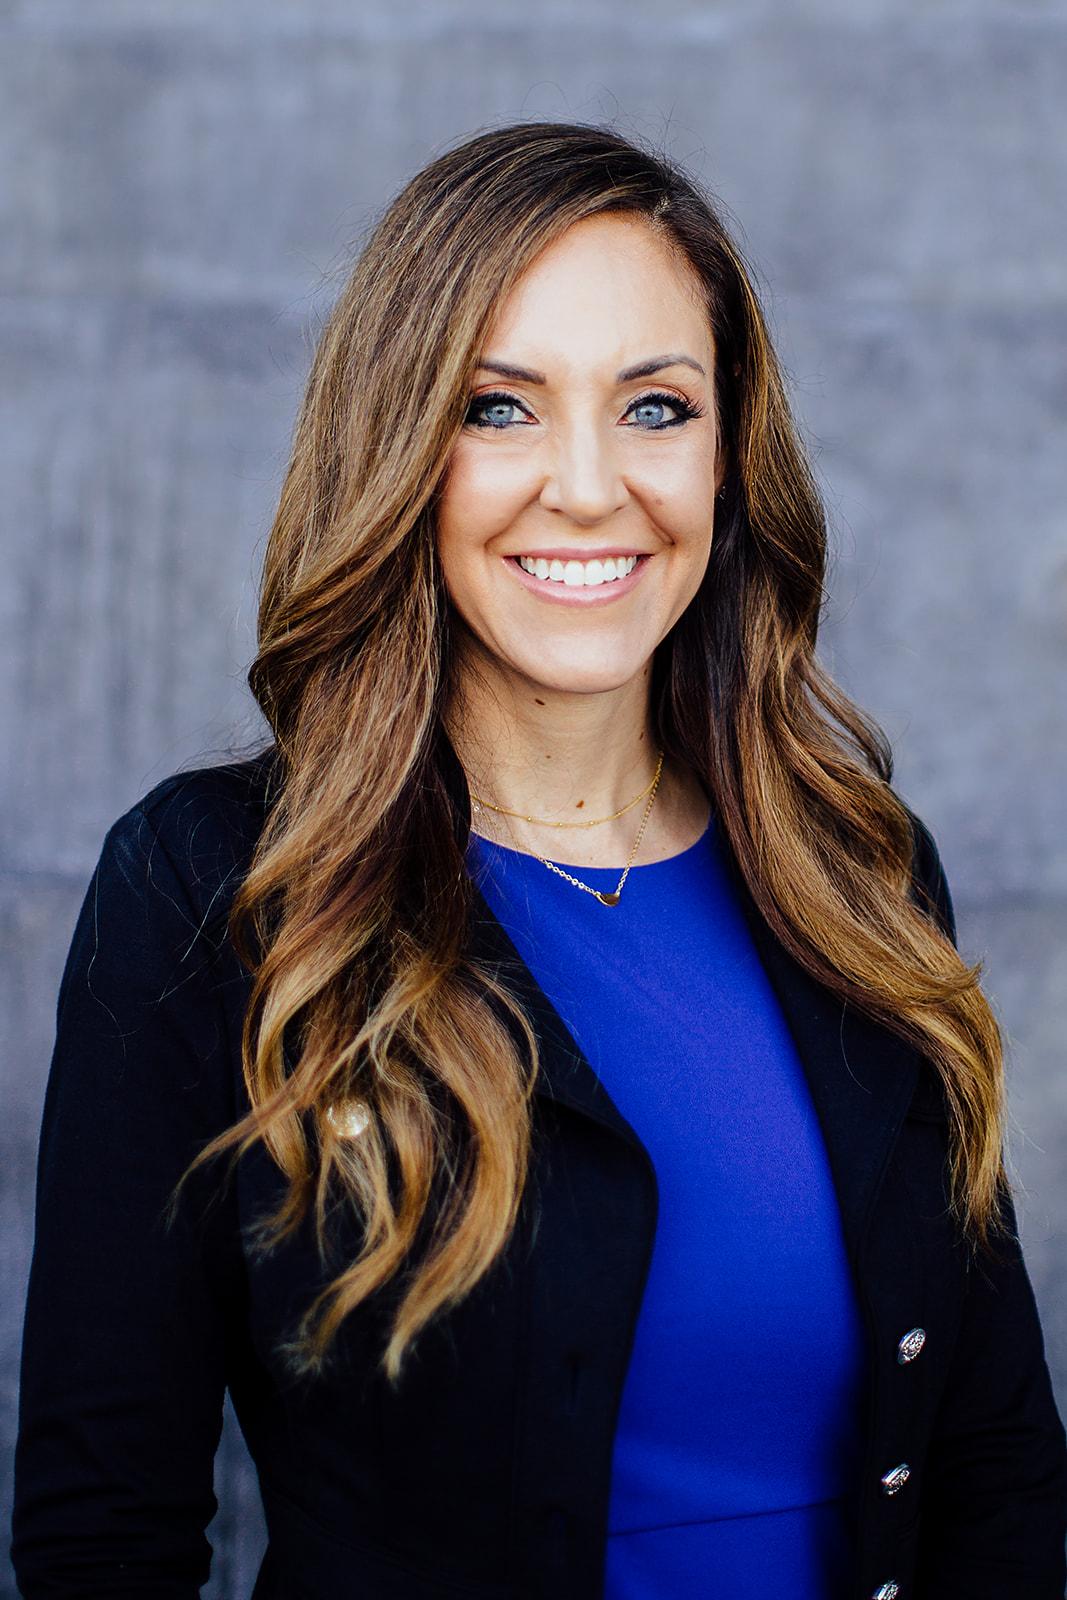 Lindsay R. McWhorter